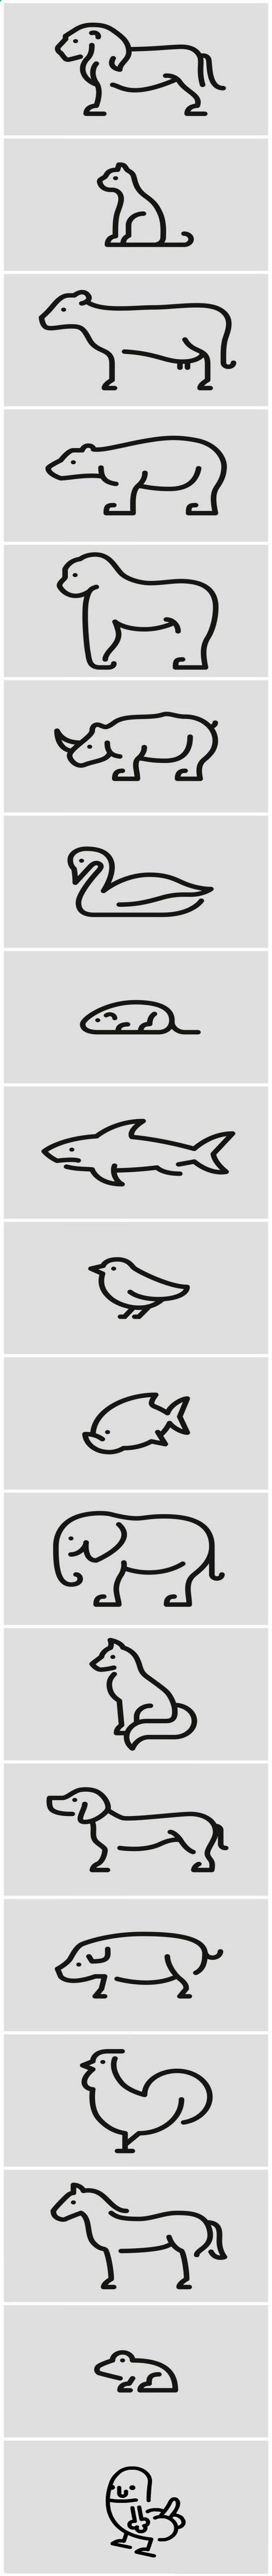 Drawing animals is easy. . Drawing animals is easy